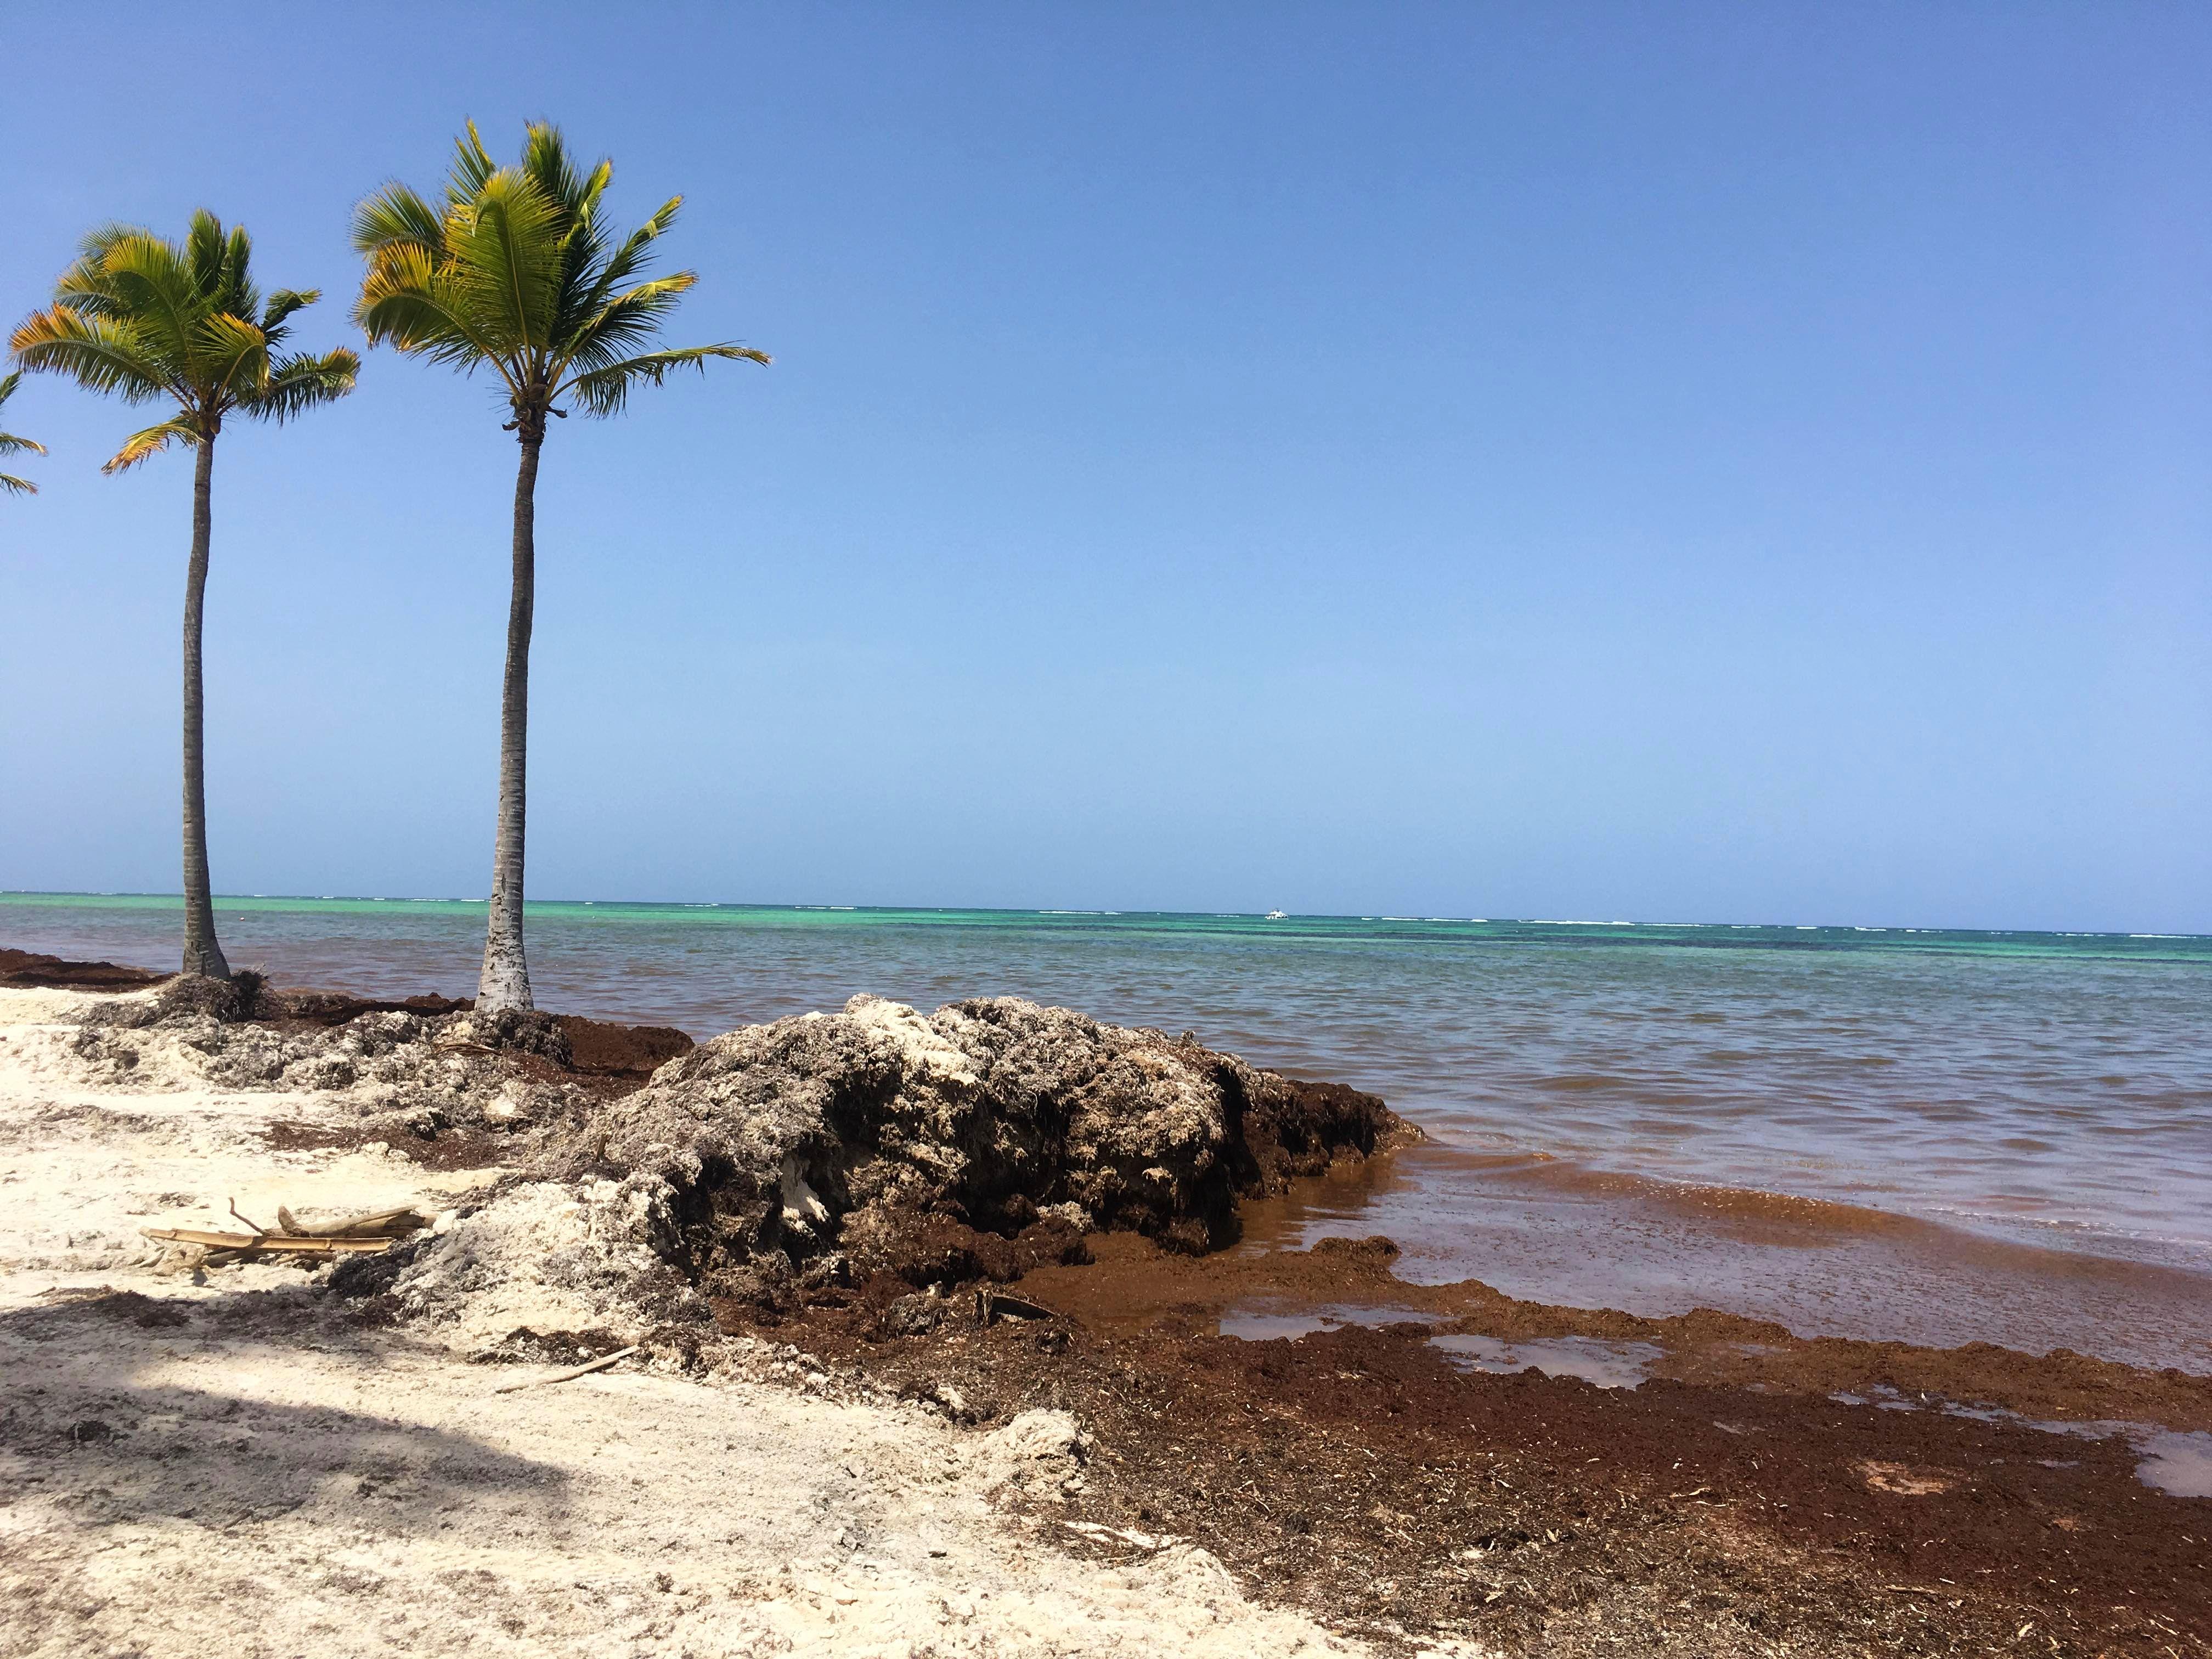 Пляжи Пунта-Кана атаковали водоросли